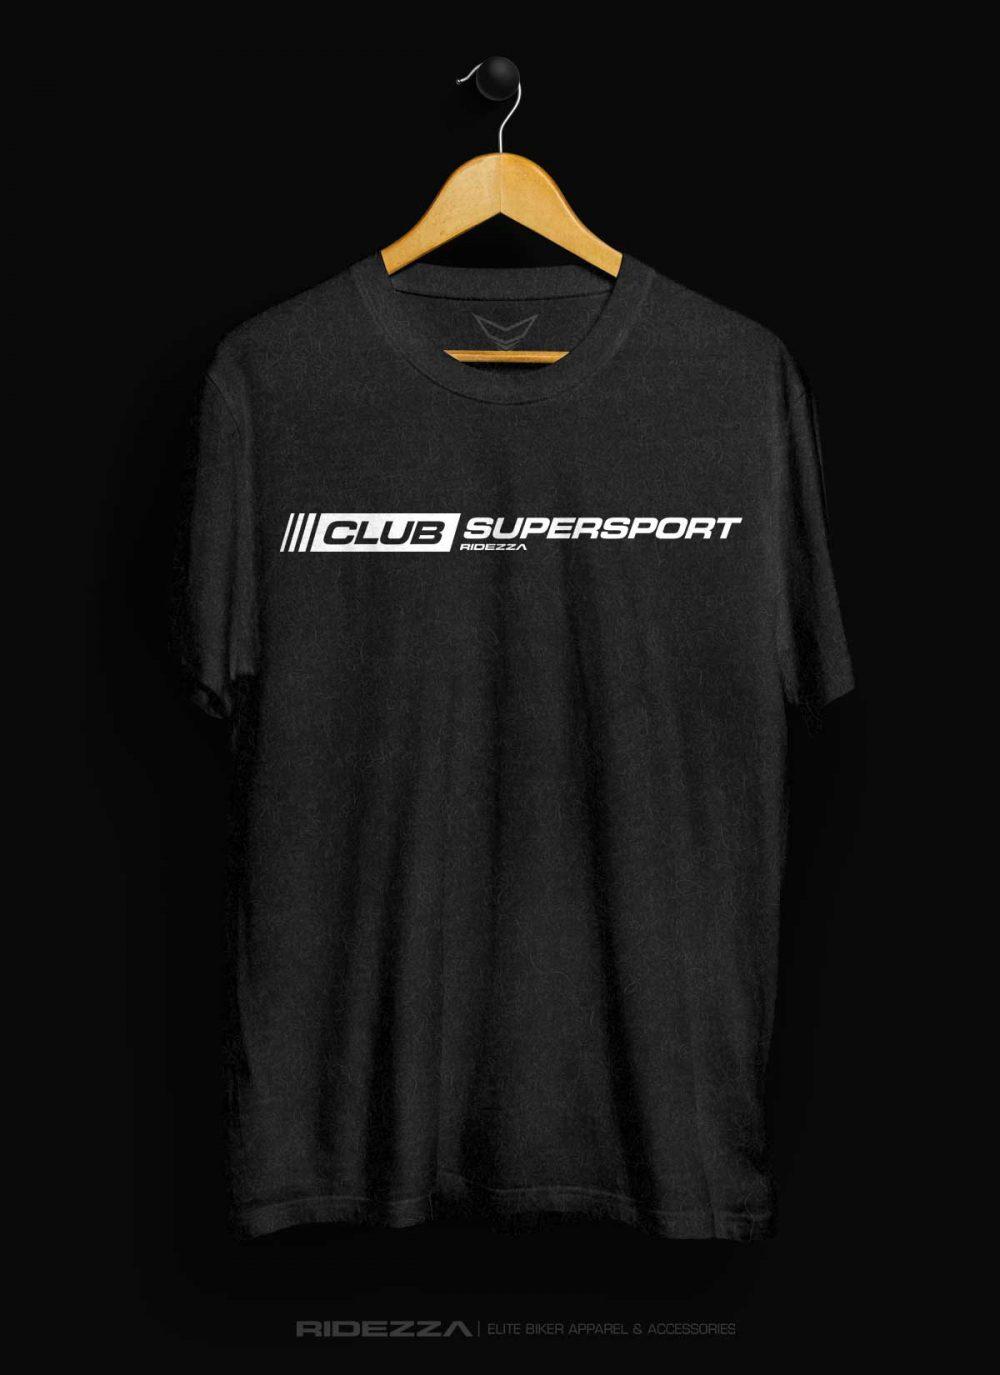 Ducati Supersport Club T-Shirt